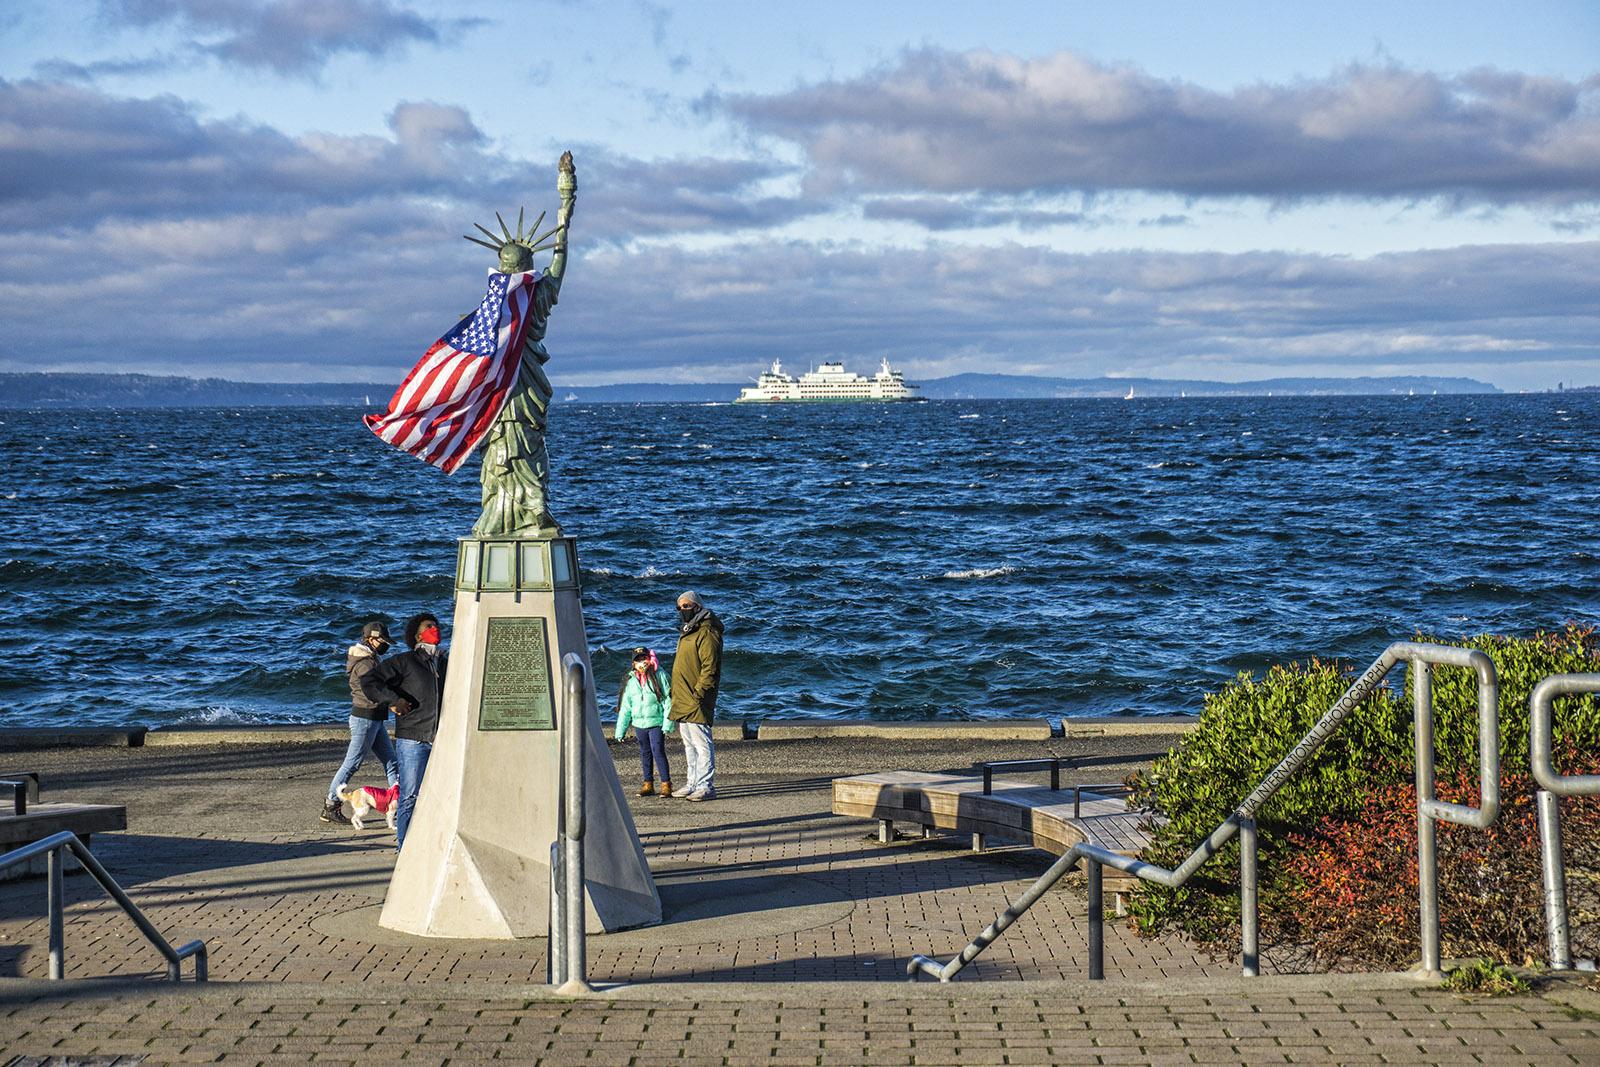 Statue of Liberty Plaza, Alki Beach, Seattle. (December 28, 2020).